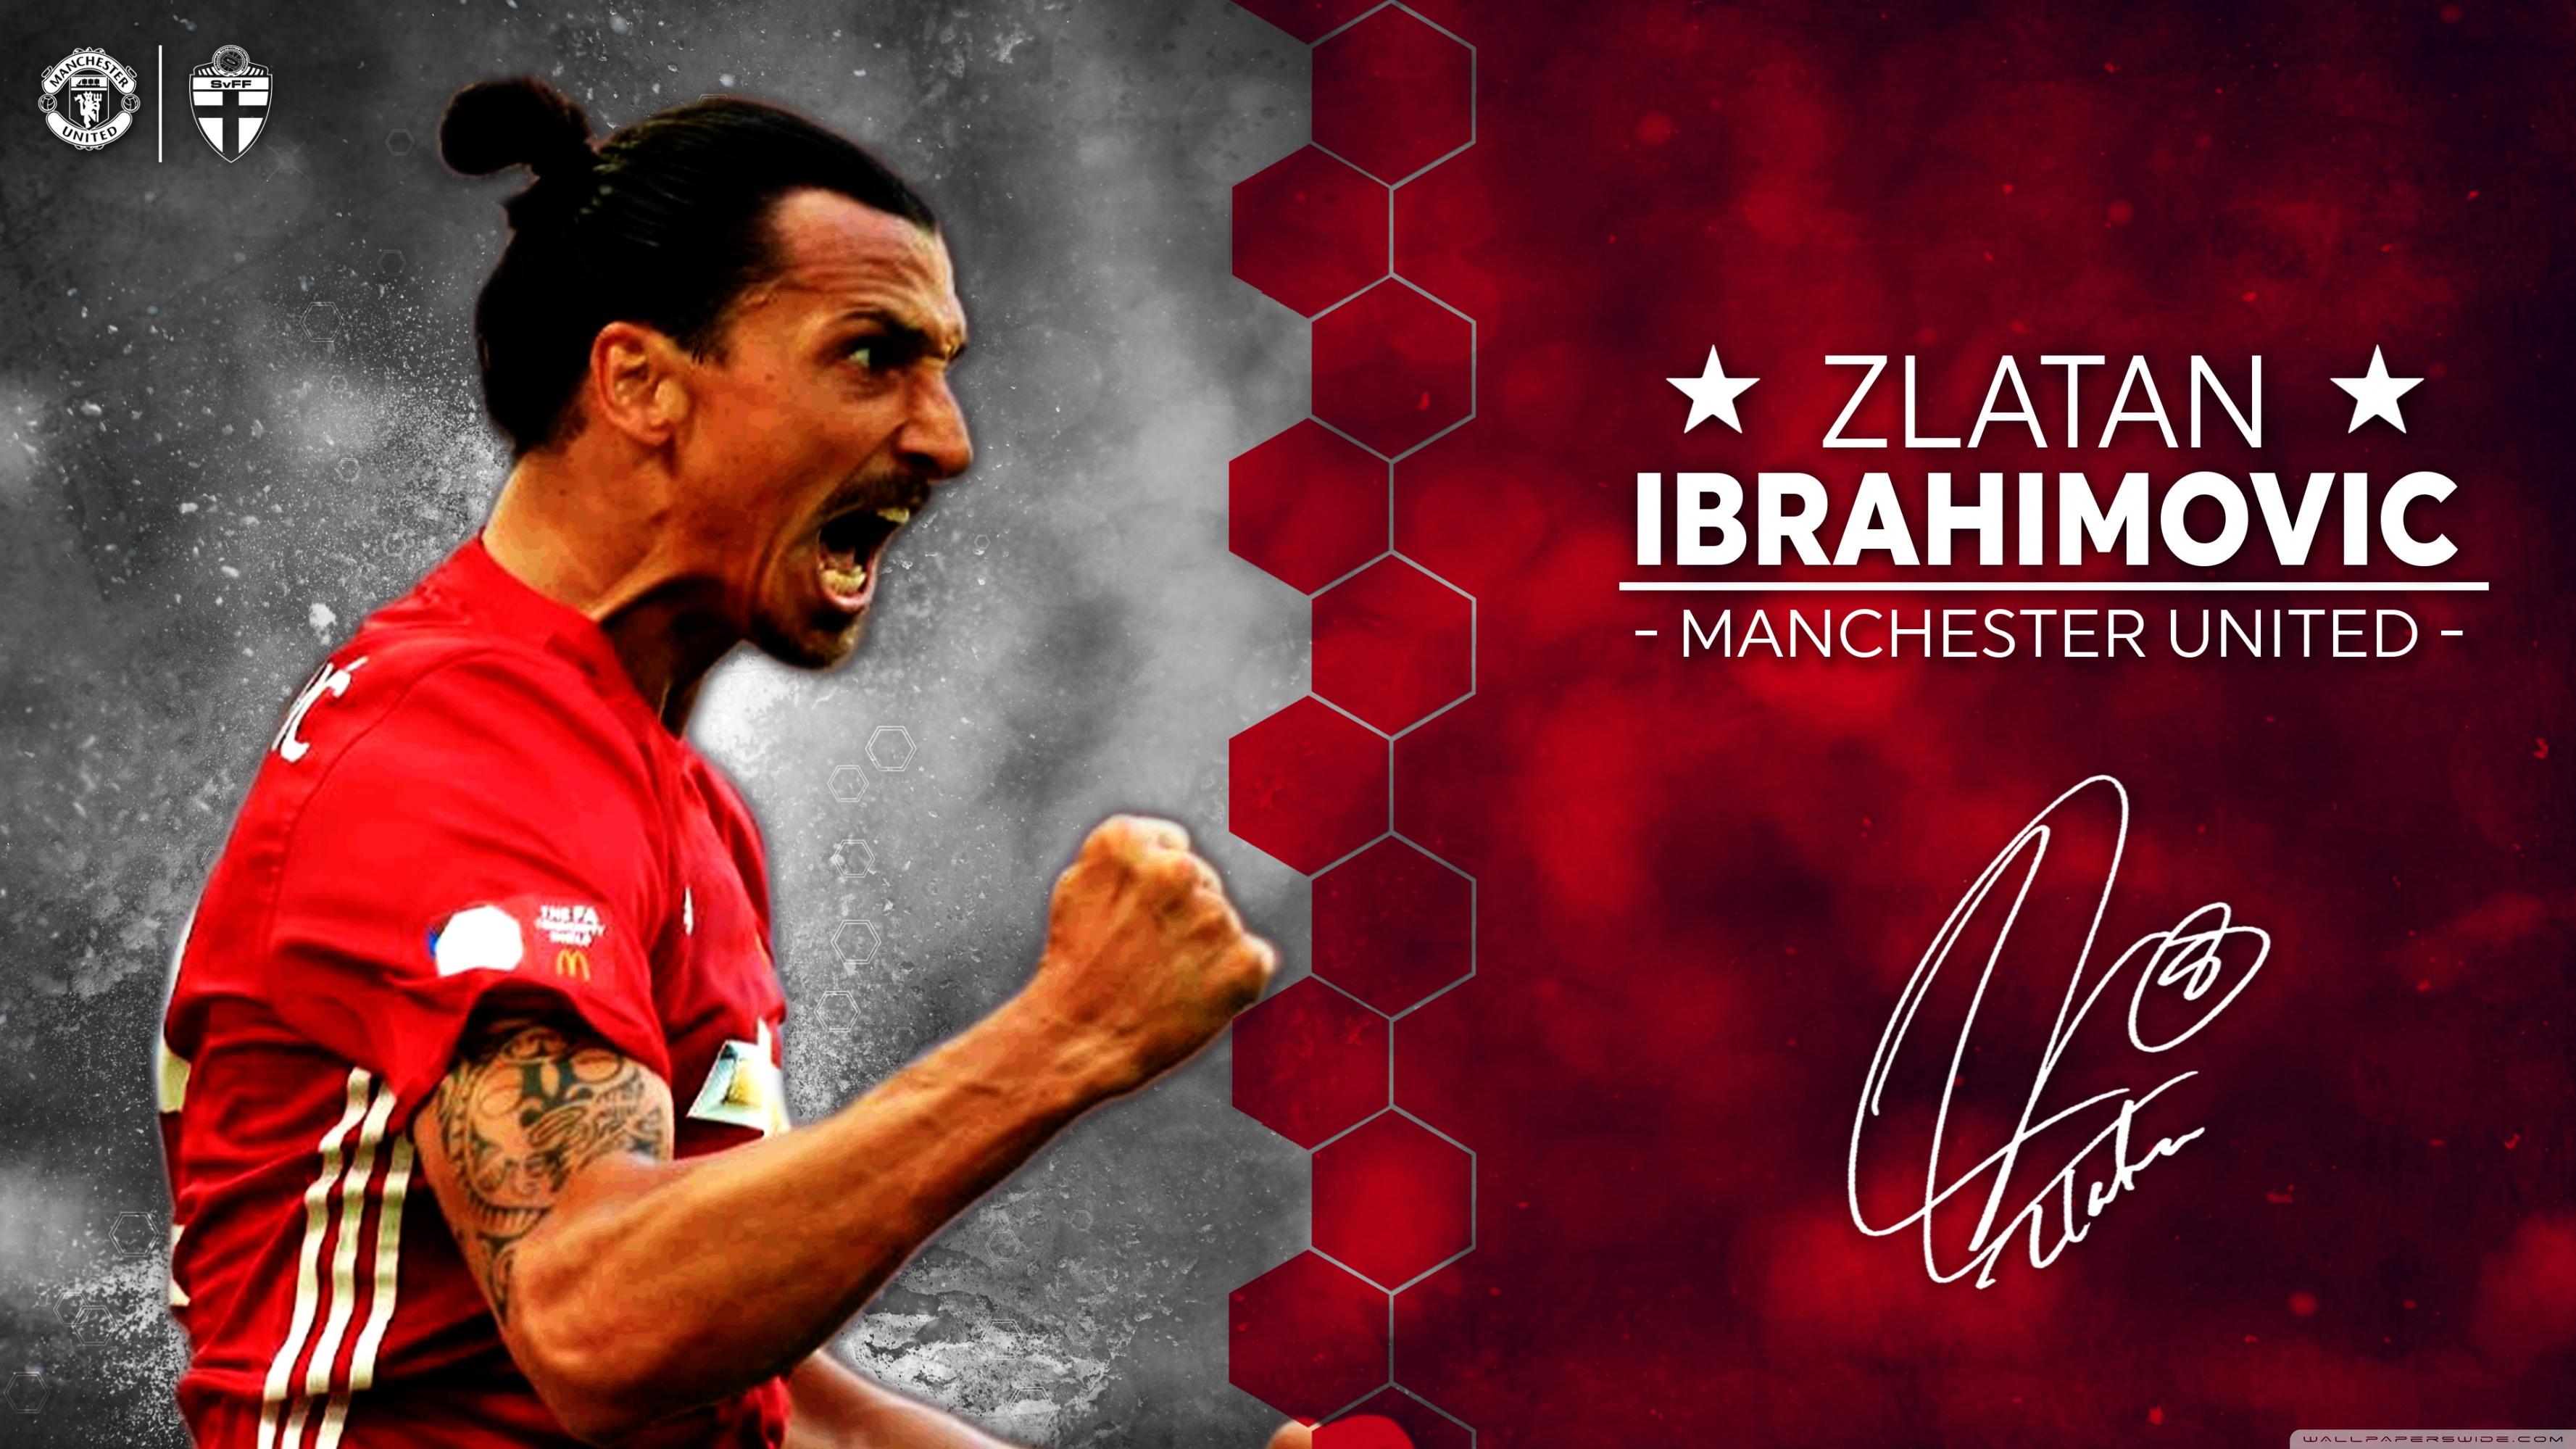 Zlatan Ibrahimovic Manchester United 2016 17 4K HD Desktop 3554x1999